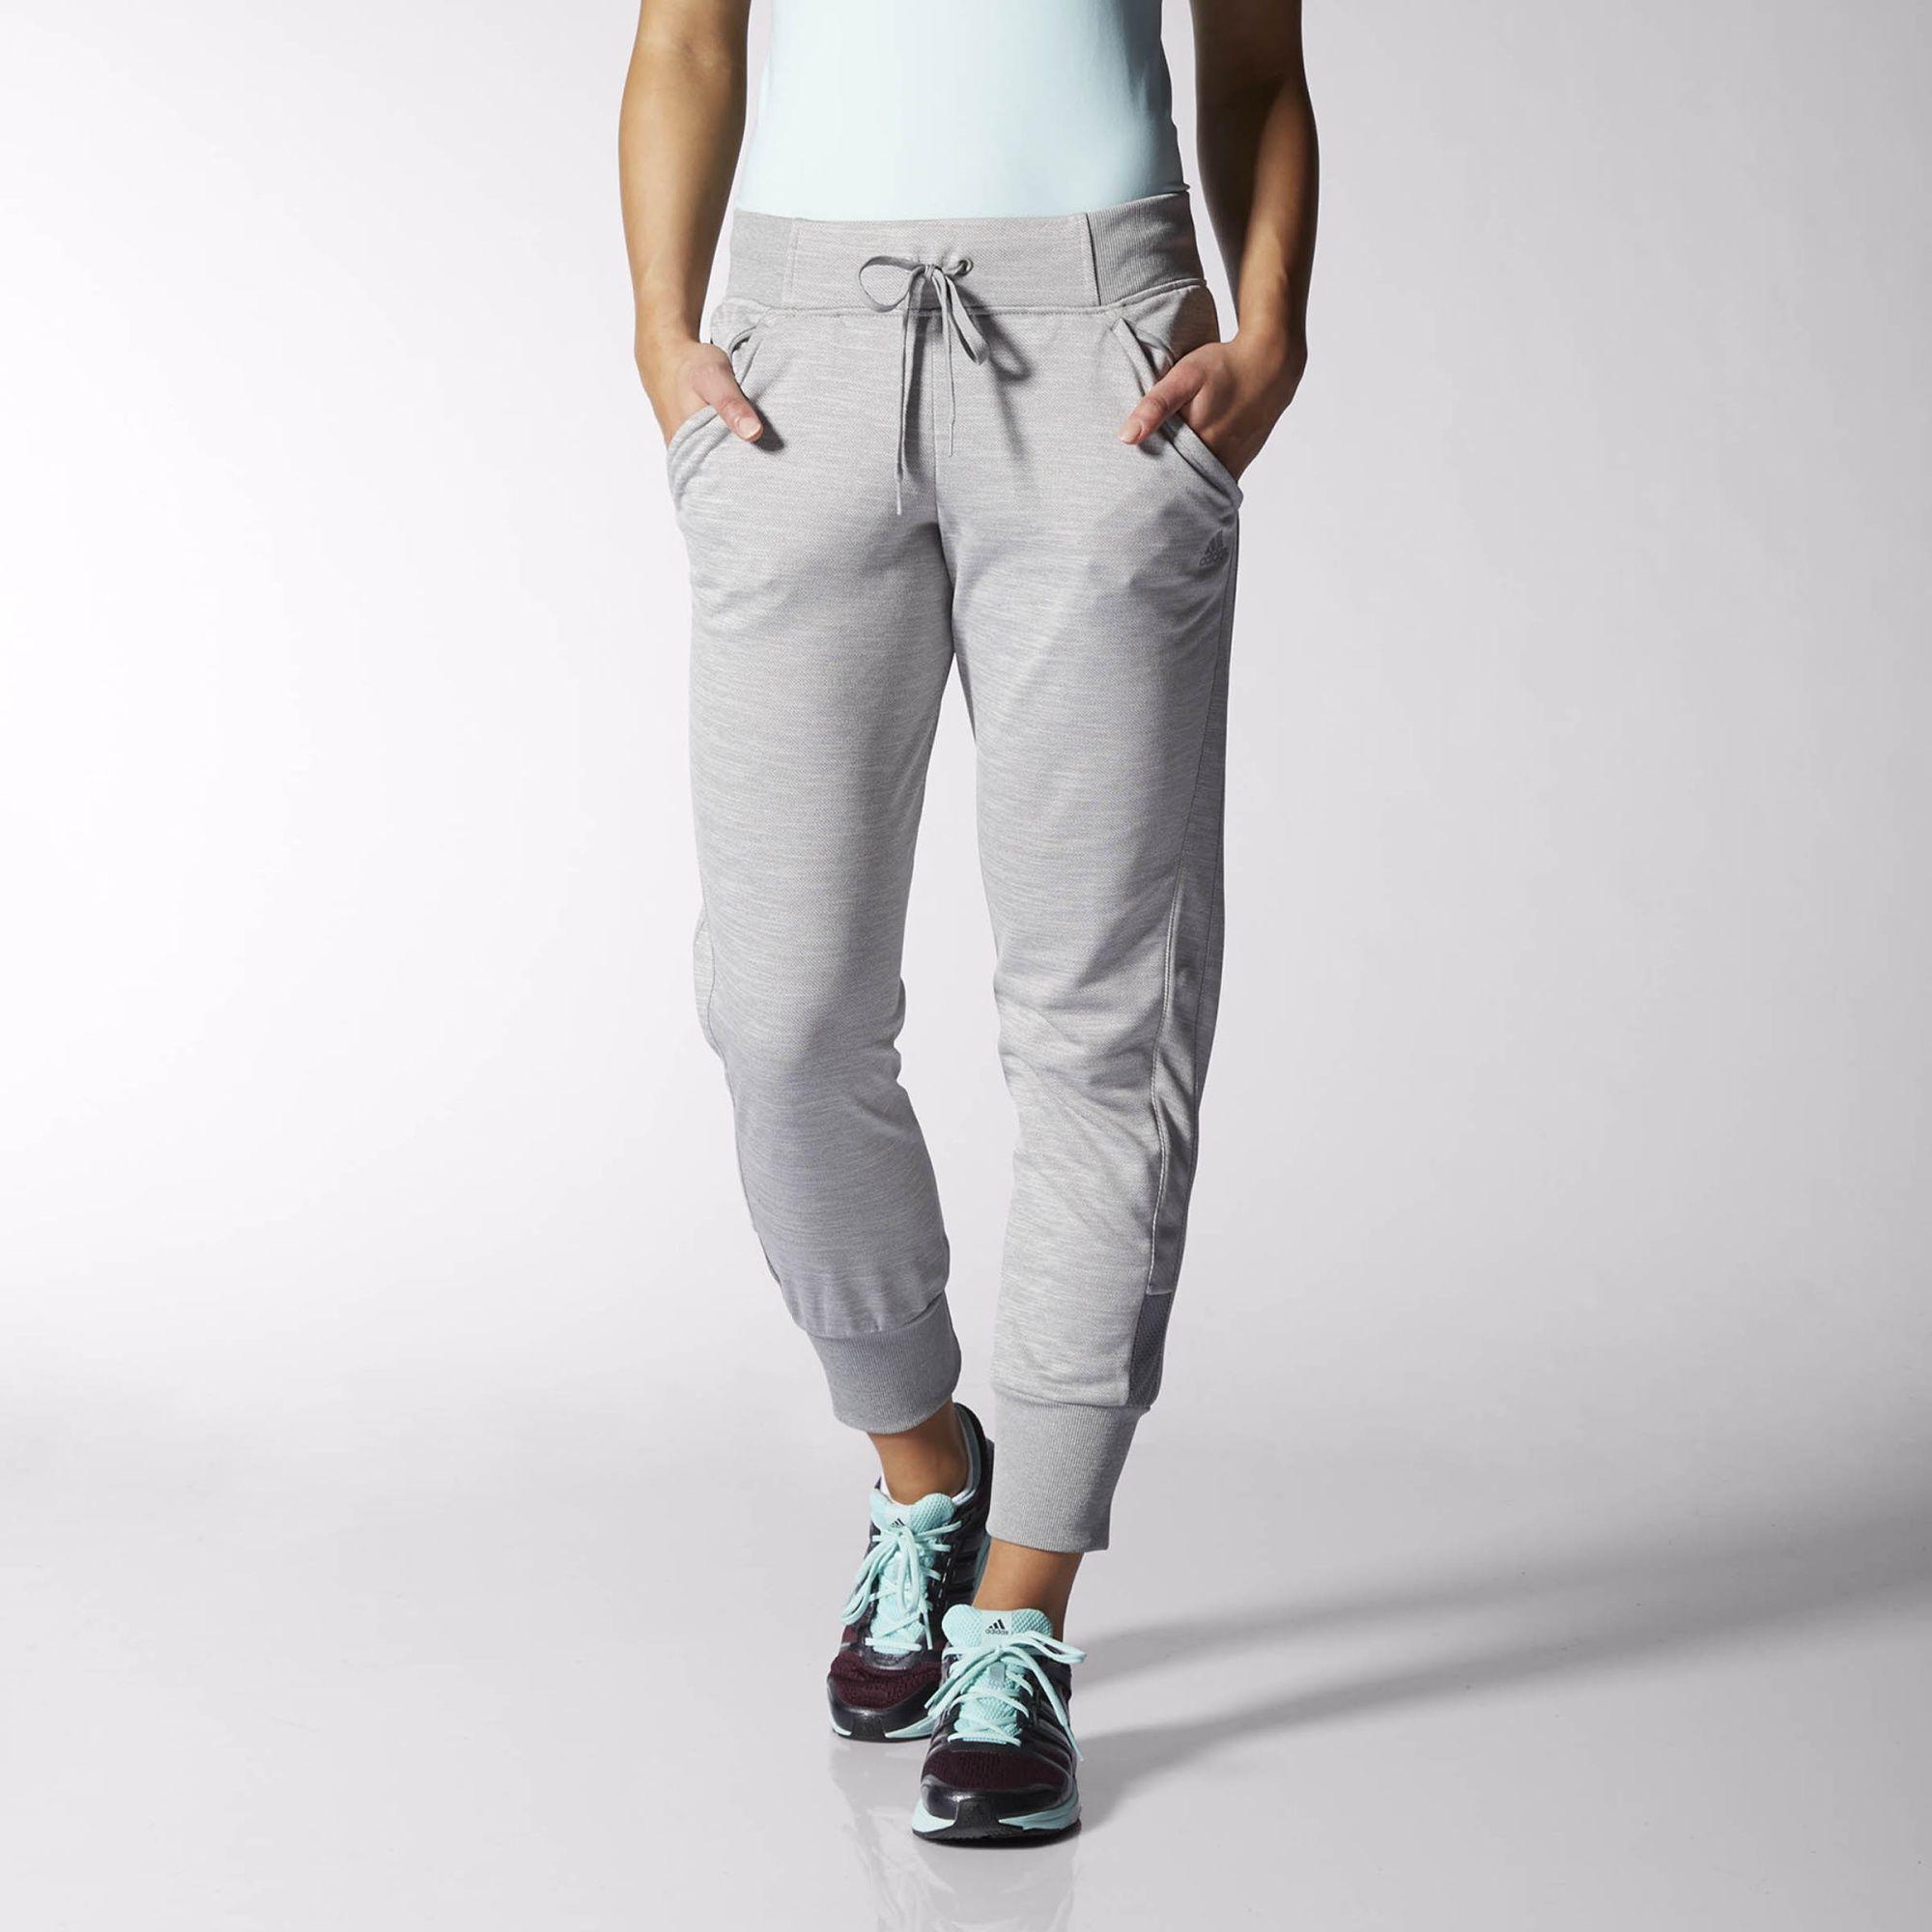 a6276ec96ce284 adidas - Beyond the Run Pants | fashion | Adidas pants, Running ...